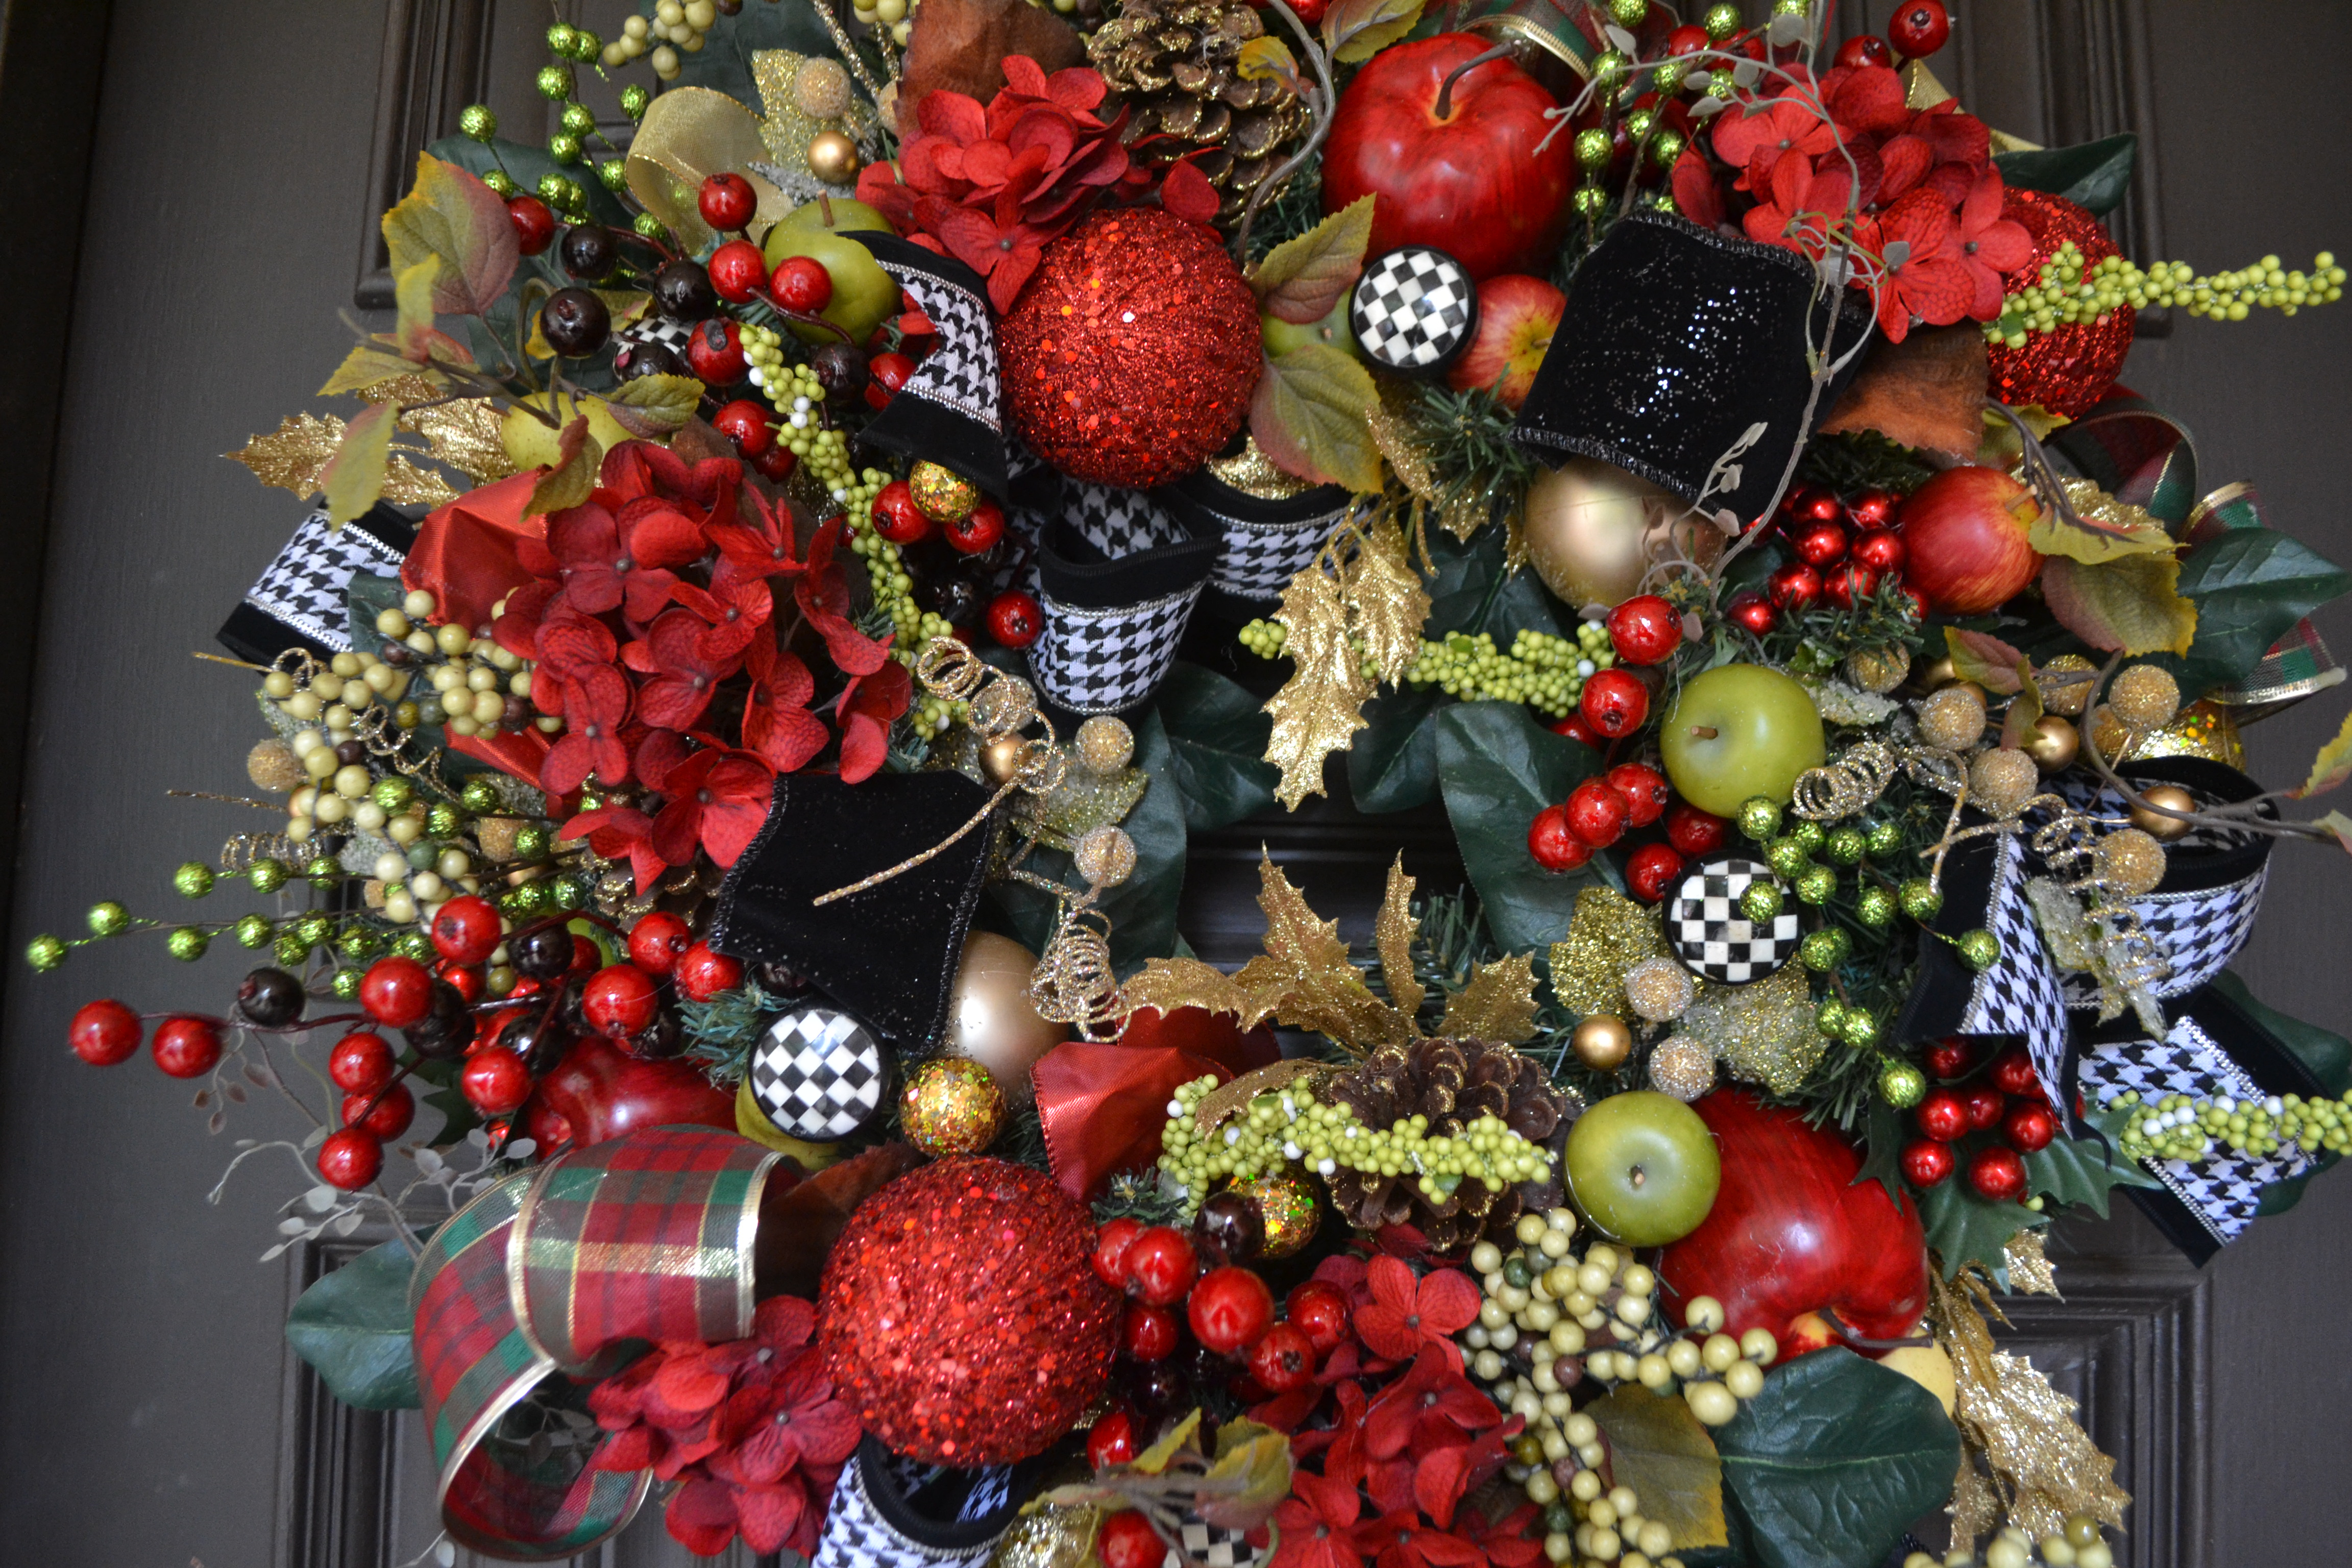 dsc_9164 - Beautiful Christmas Wreaths